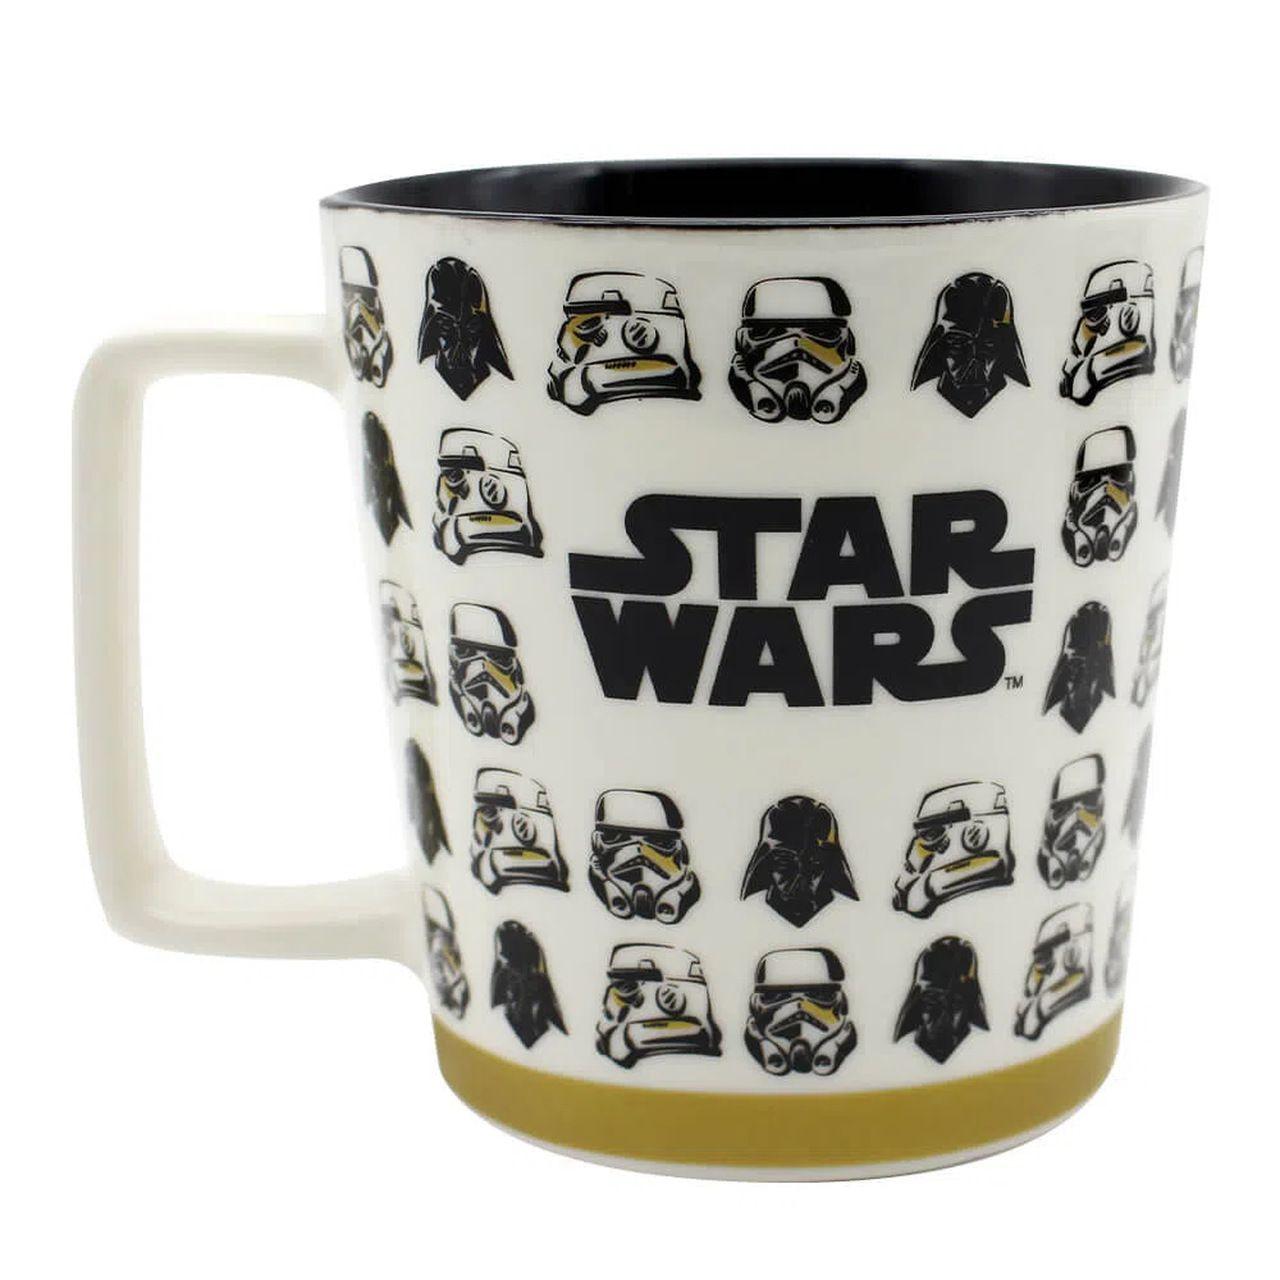 Caneca Buck Stormtroopers e Darth Vader: Star Wars (400ml) - Zona Criativa